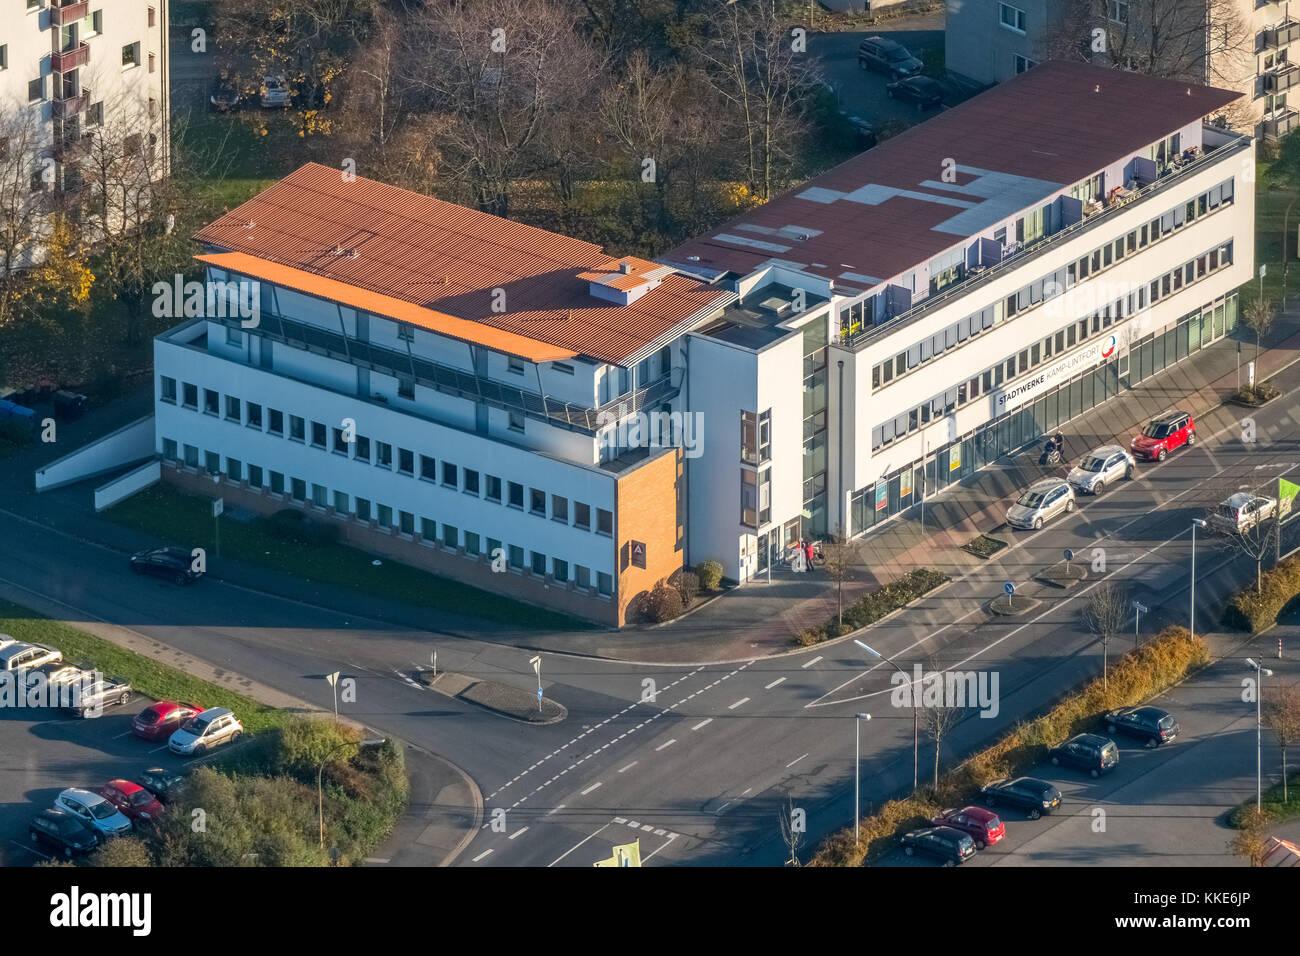 Stadtwerke Kamp - Kamp-lintfort, Energieversorgungsunternehmen, Stadt Hitze Kamp - Kamp-lintfort, Bundesagentur Stockbild